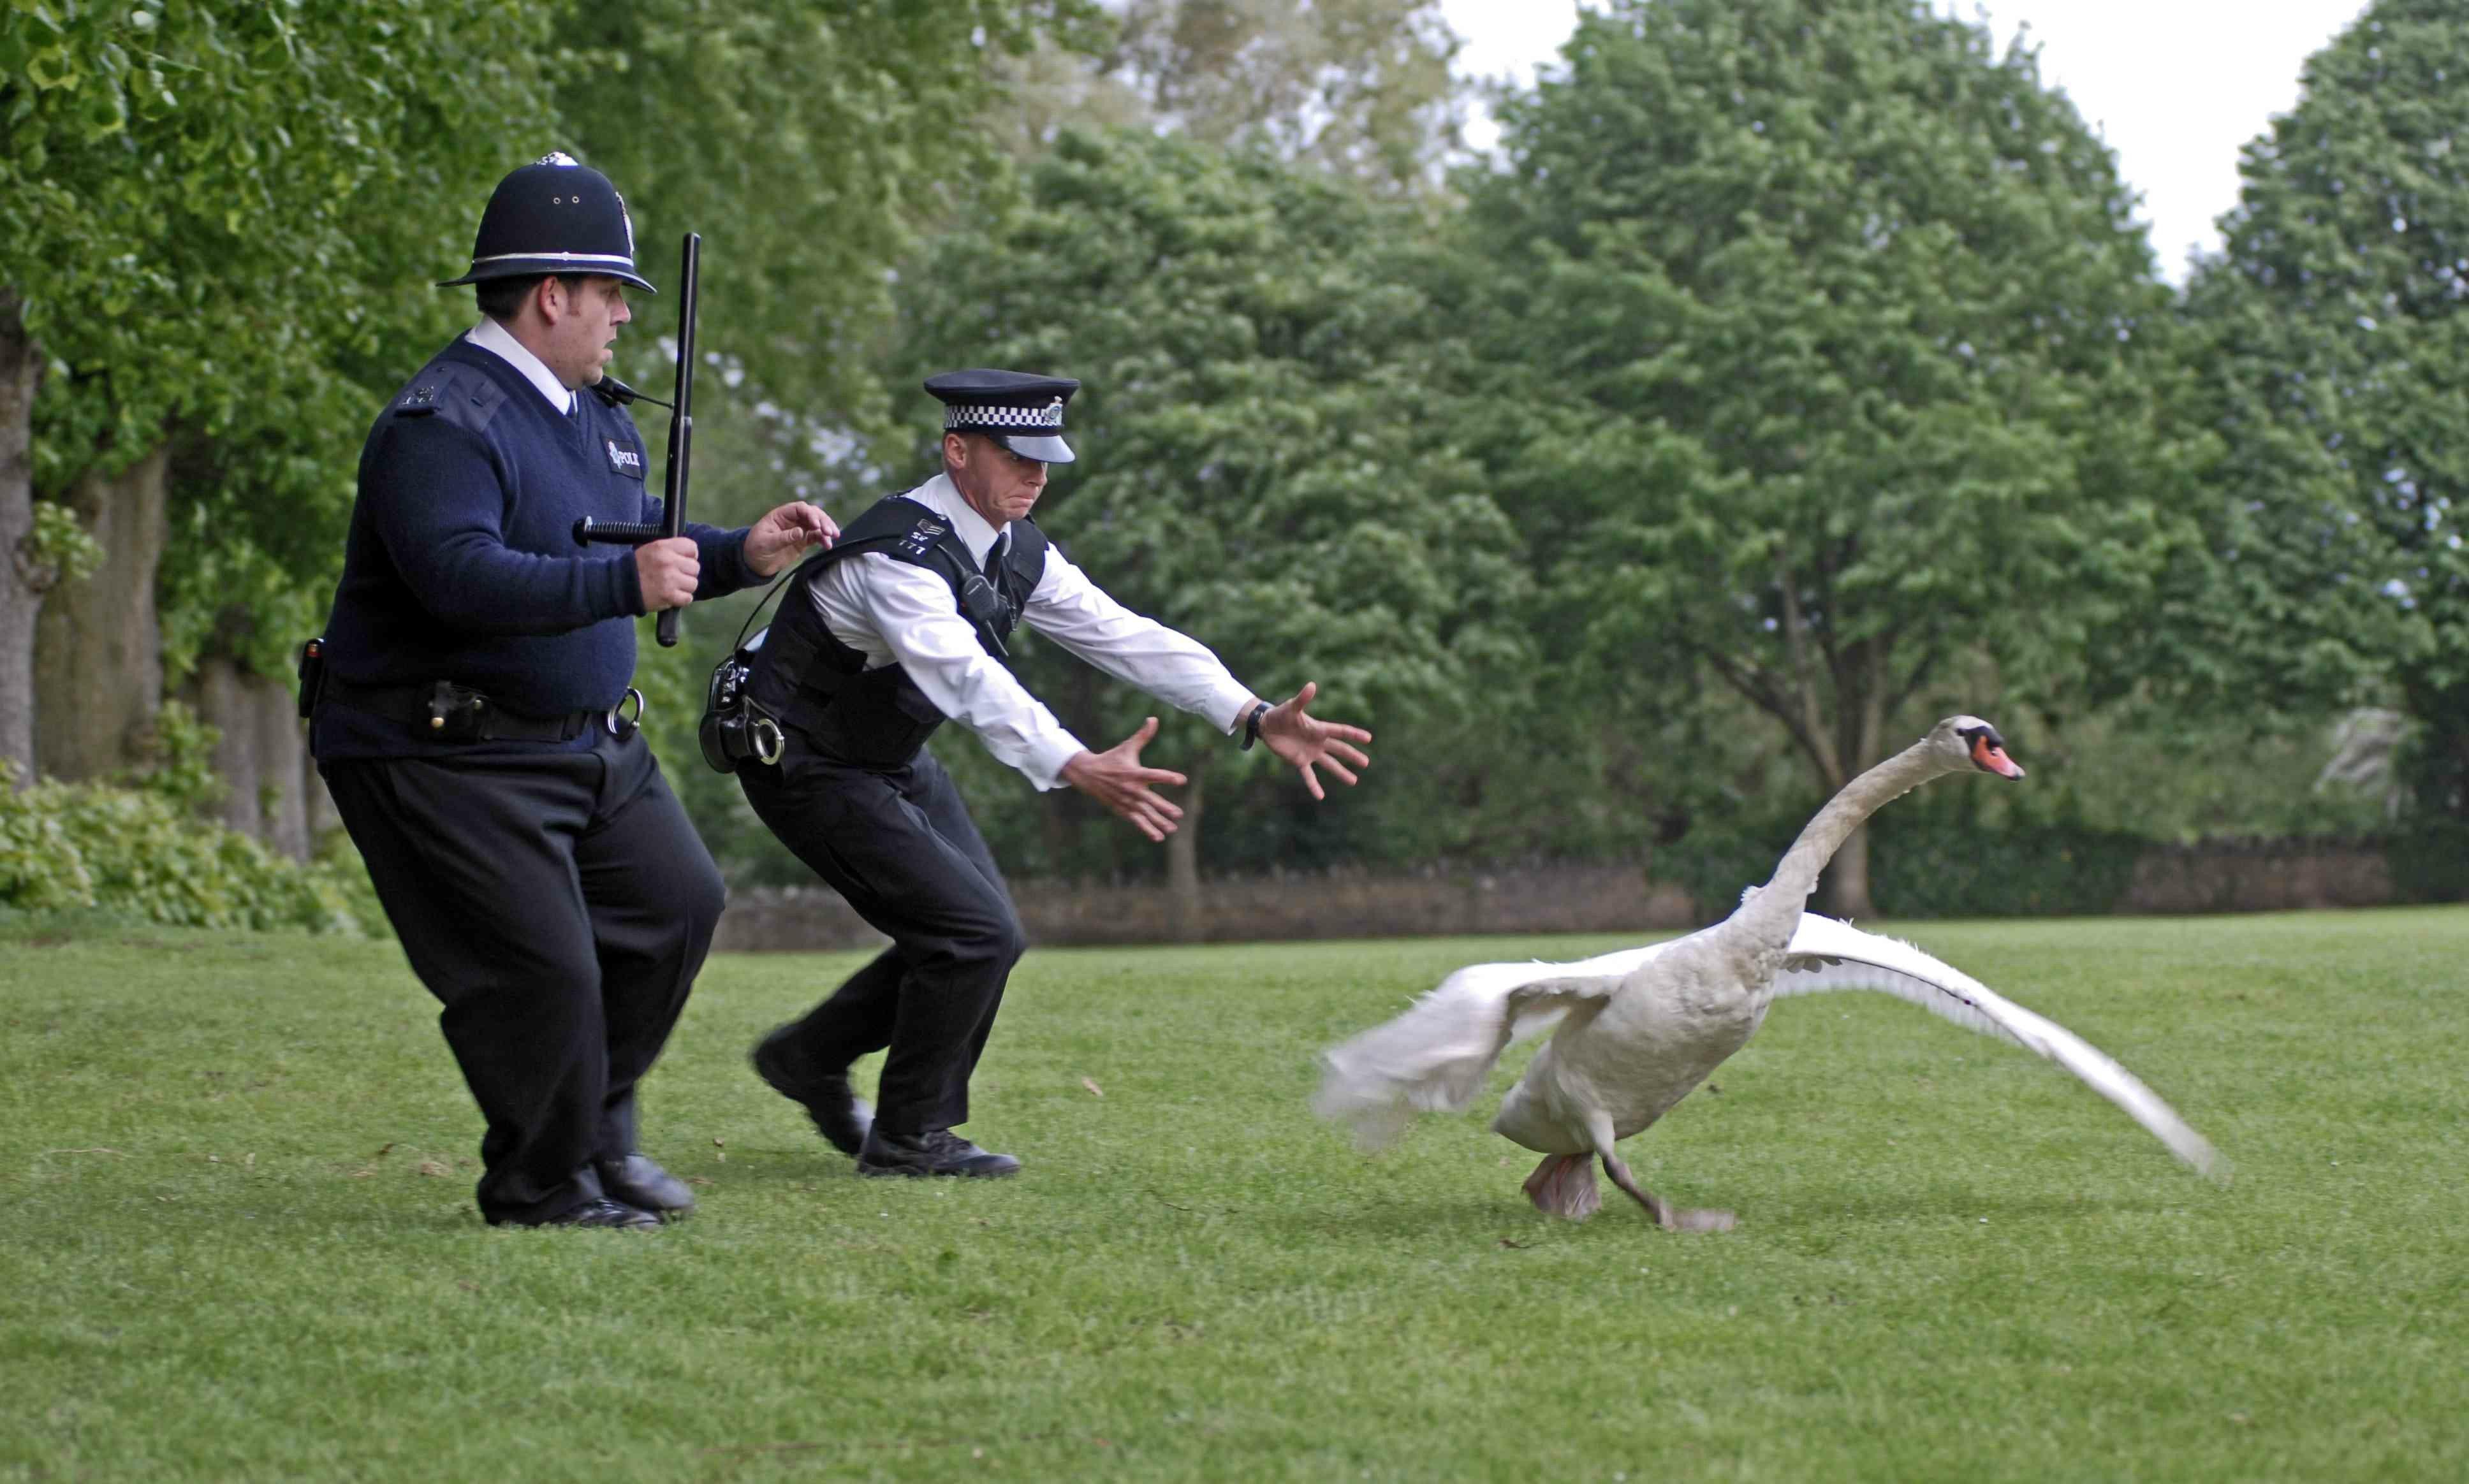 wild-goose chase